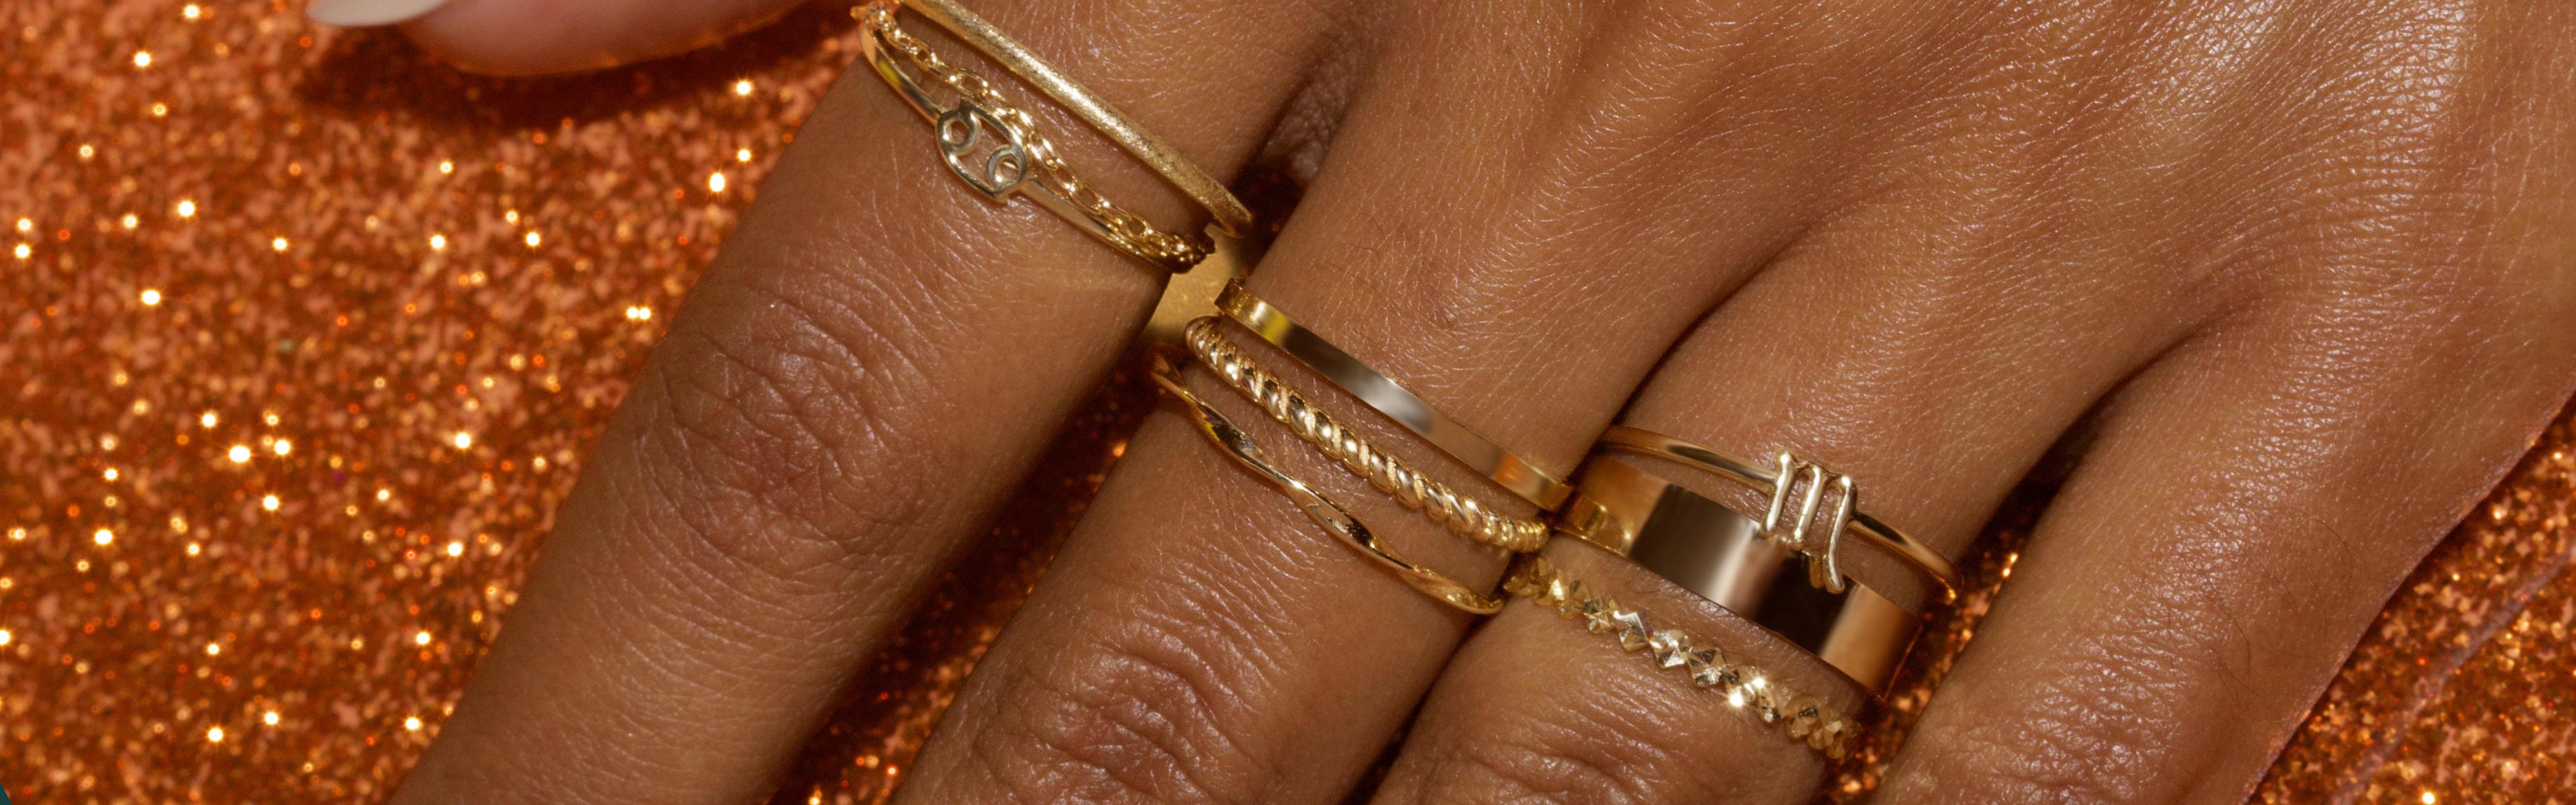 Gold Staples